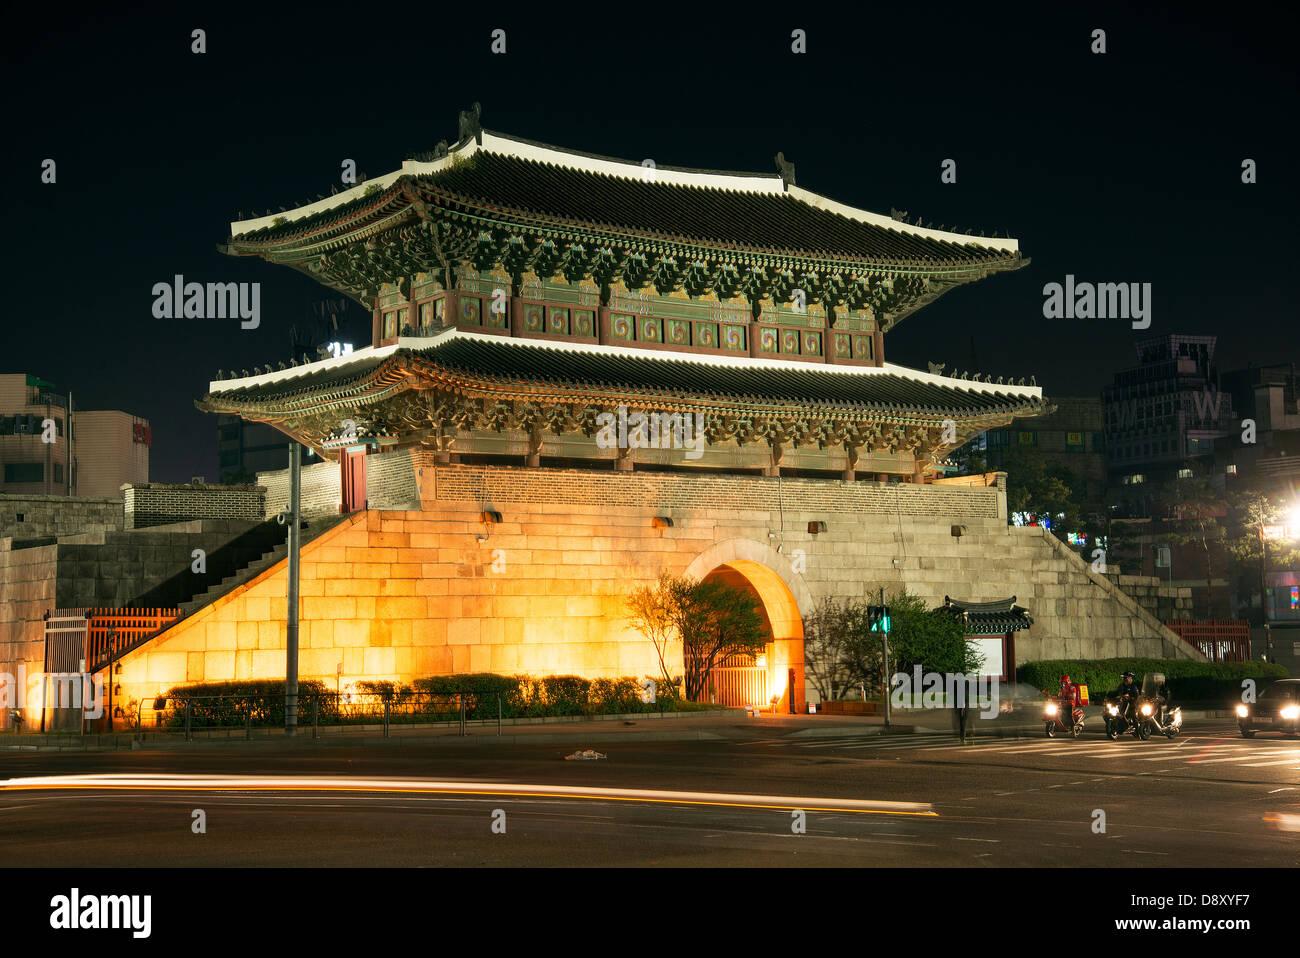 dongdaemun gate landmark in seoul south korea at night - Stock Image